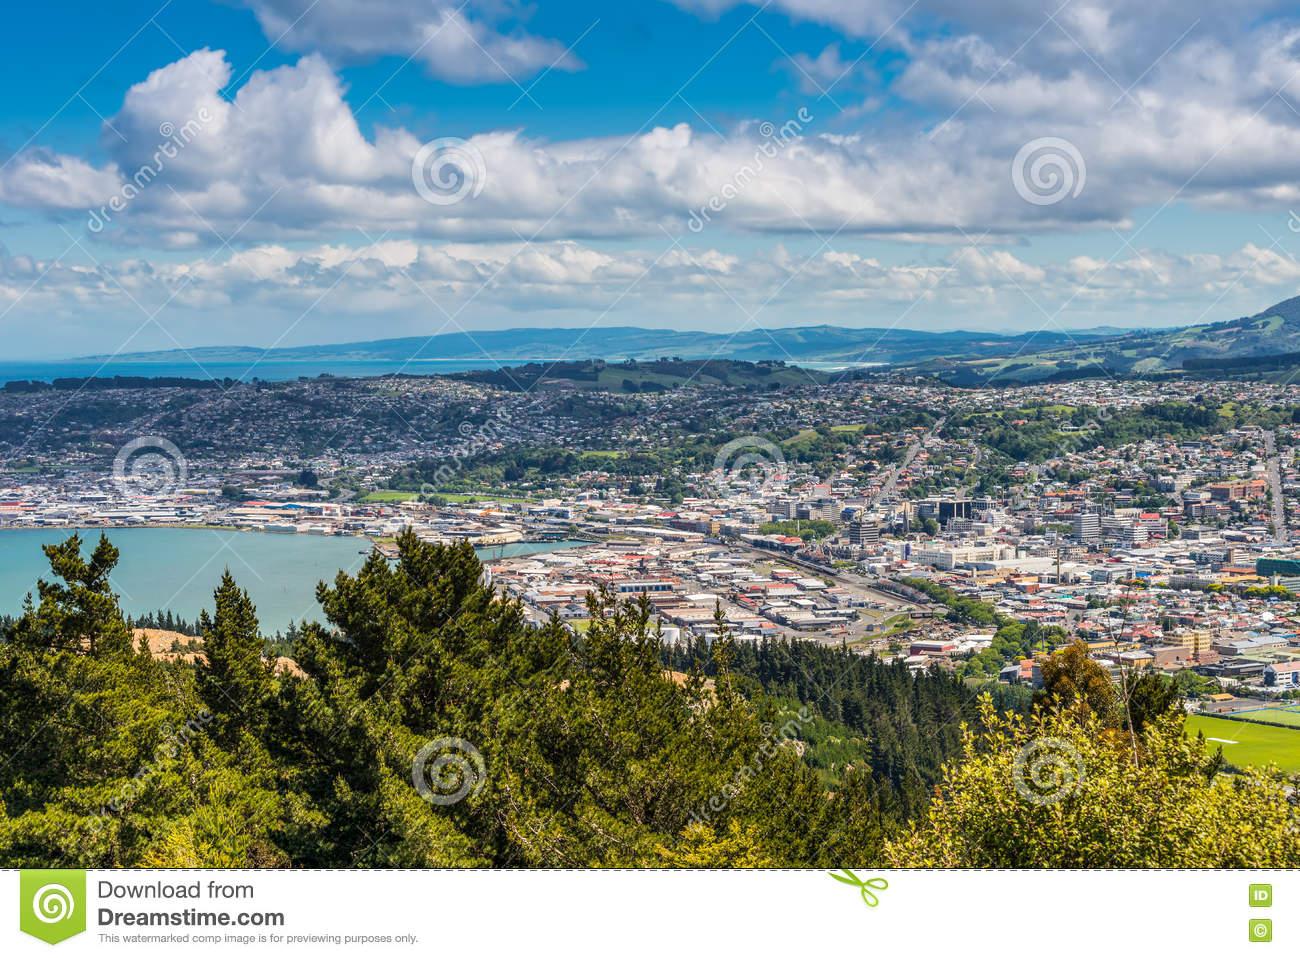 Dunedin Seen From The Peak Of Signal Hill, New Zealand Stock Photo.